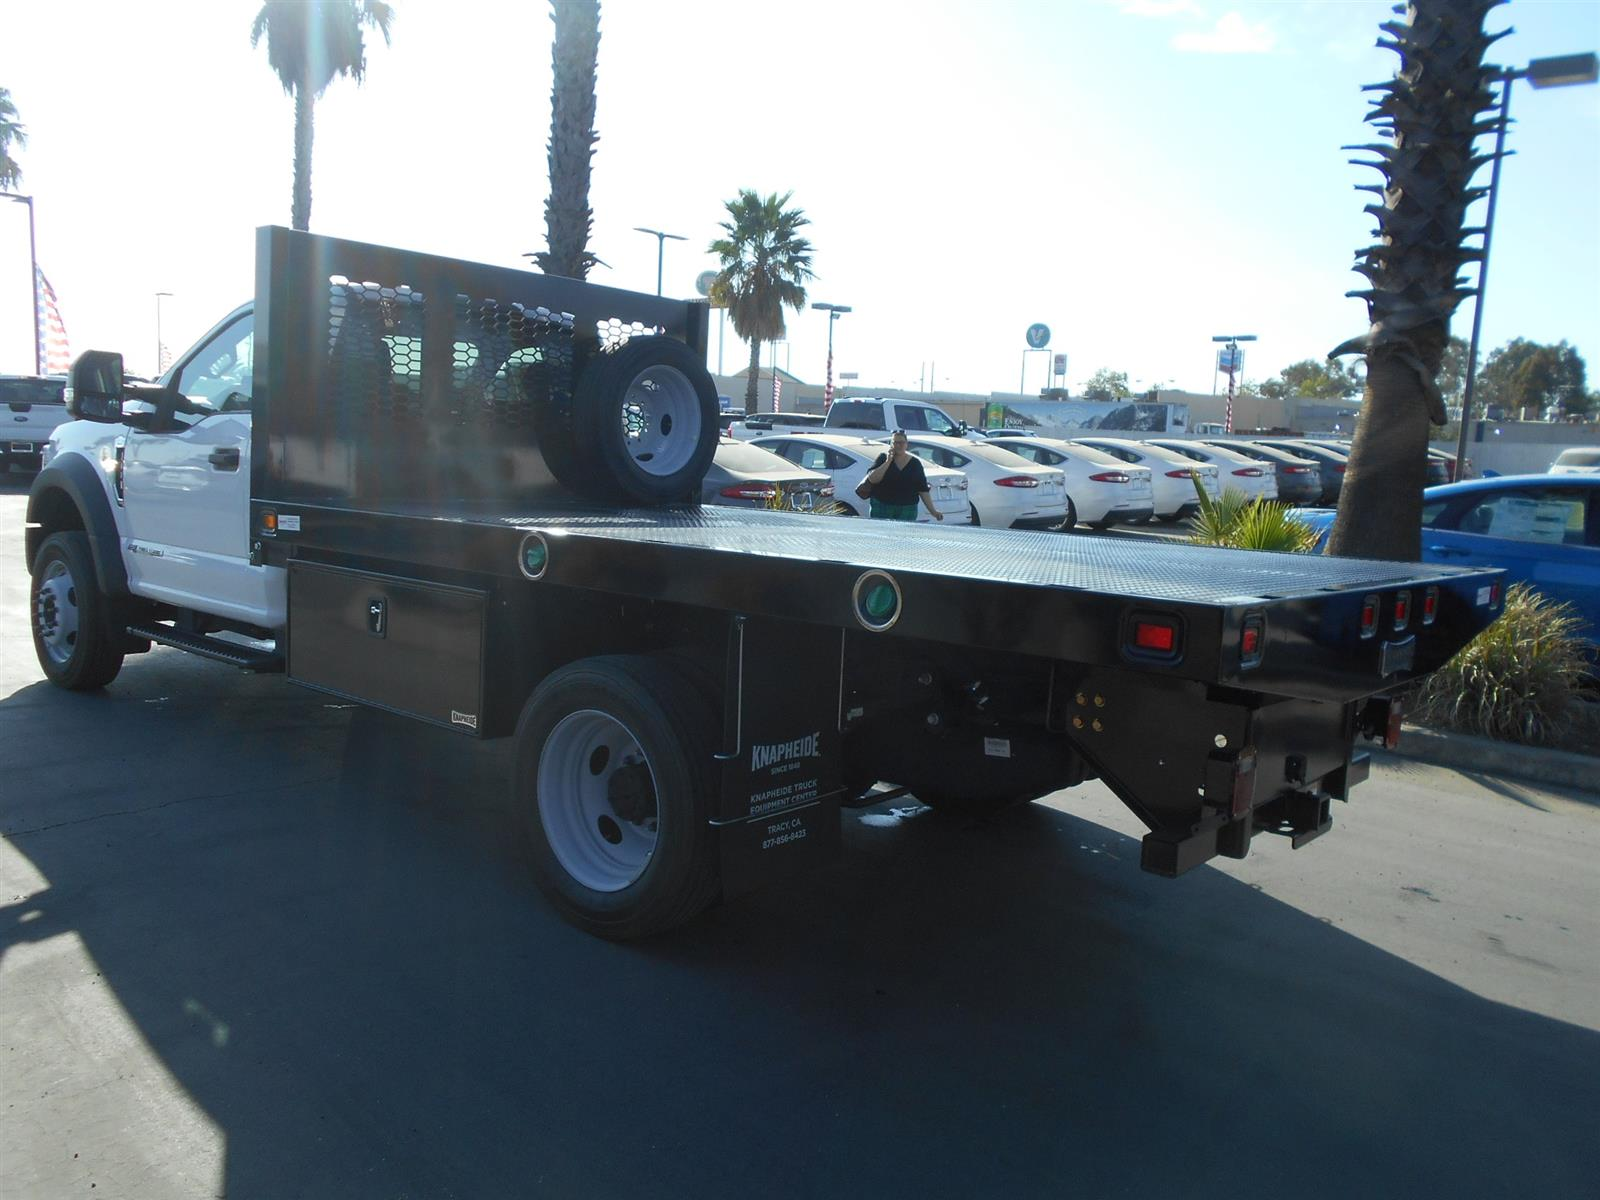 2020 Ford F-550 Regular Cab DRW 4x4, Knapheide Platform Body #57580 - photo 1